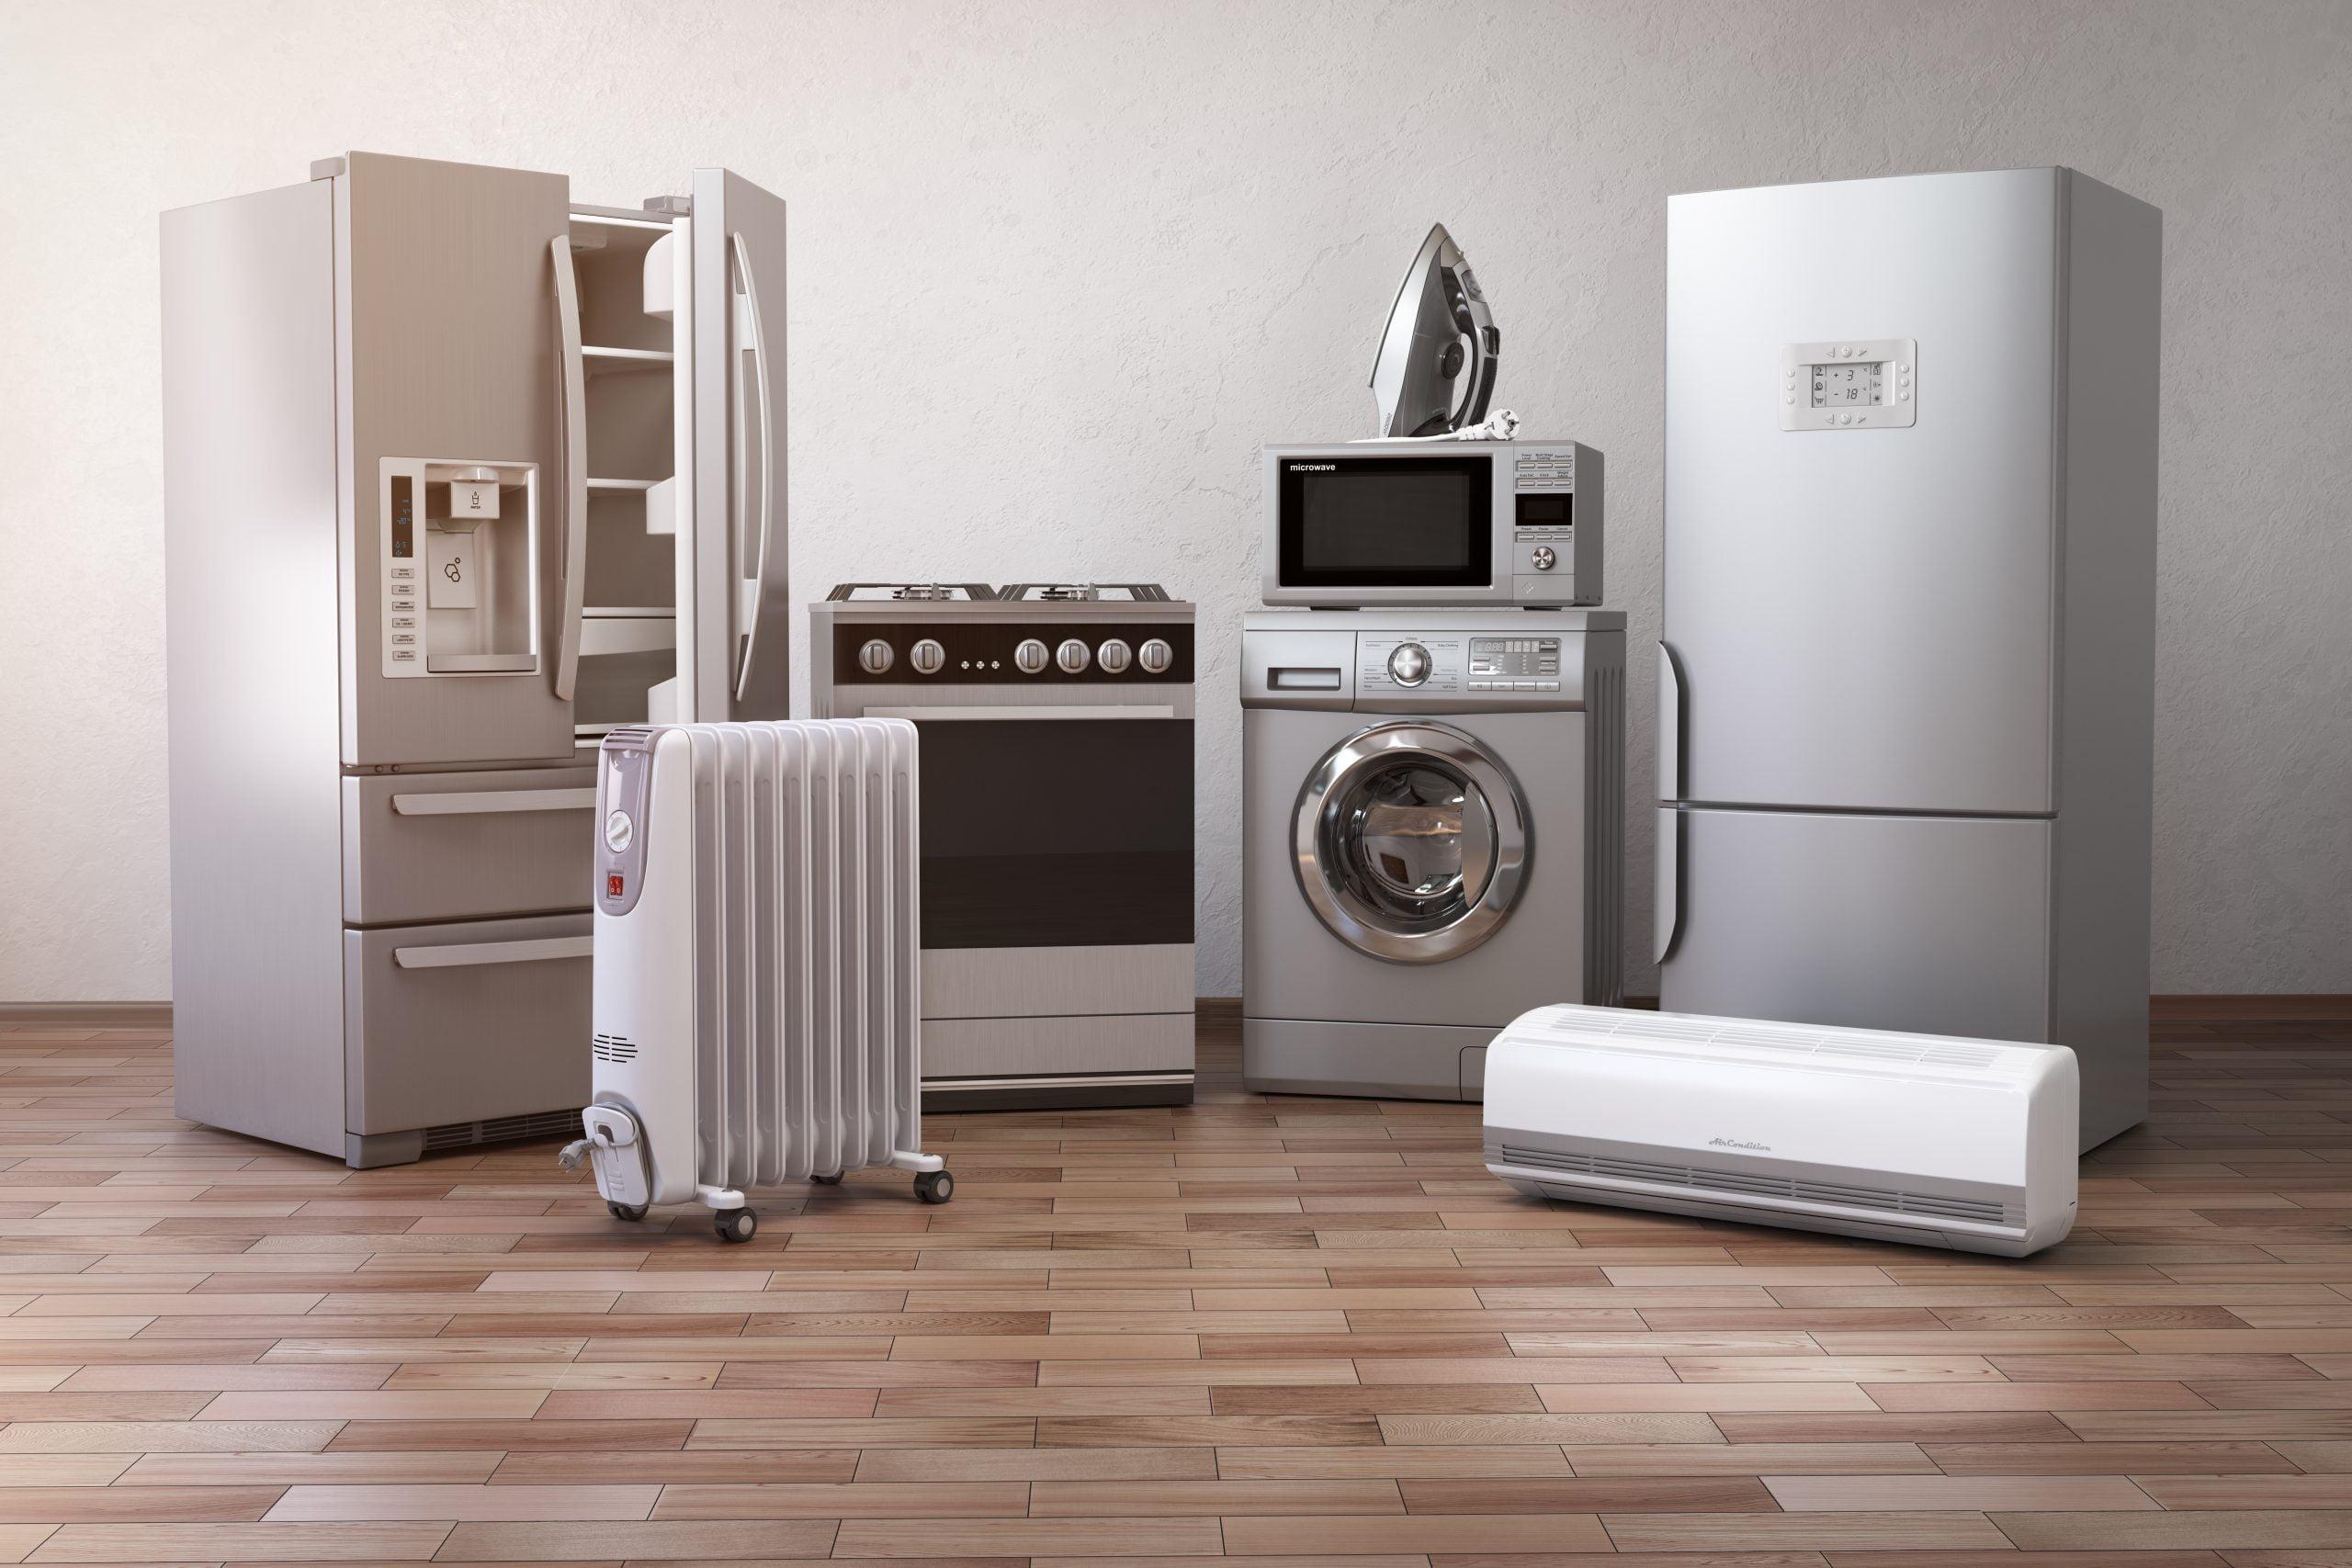 Haushaltsgeräteindustrie, Home appliance industry, Industrija bele tehnike